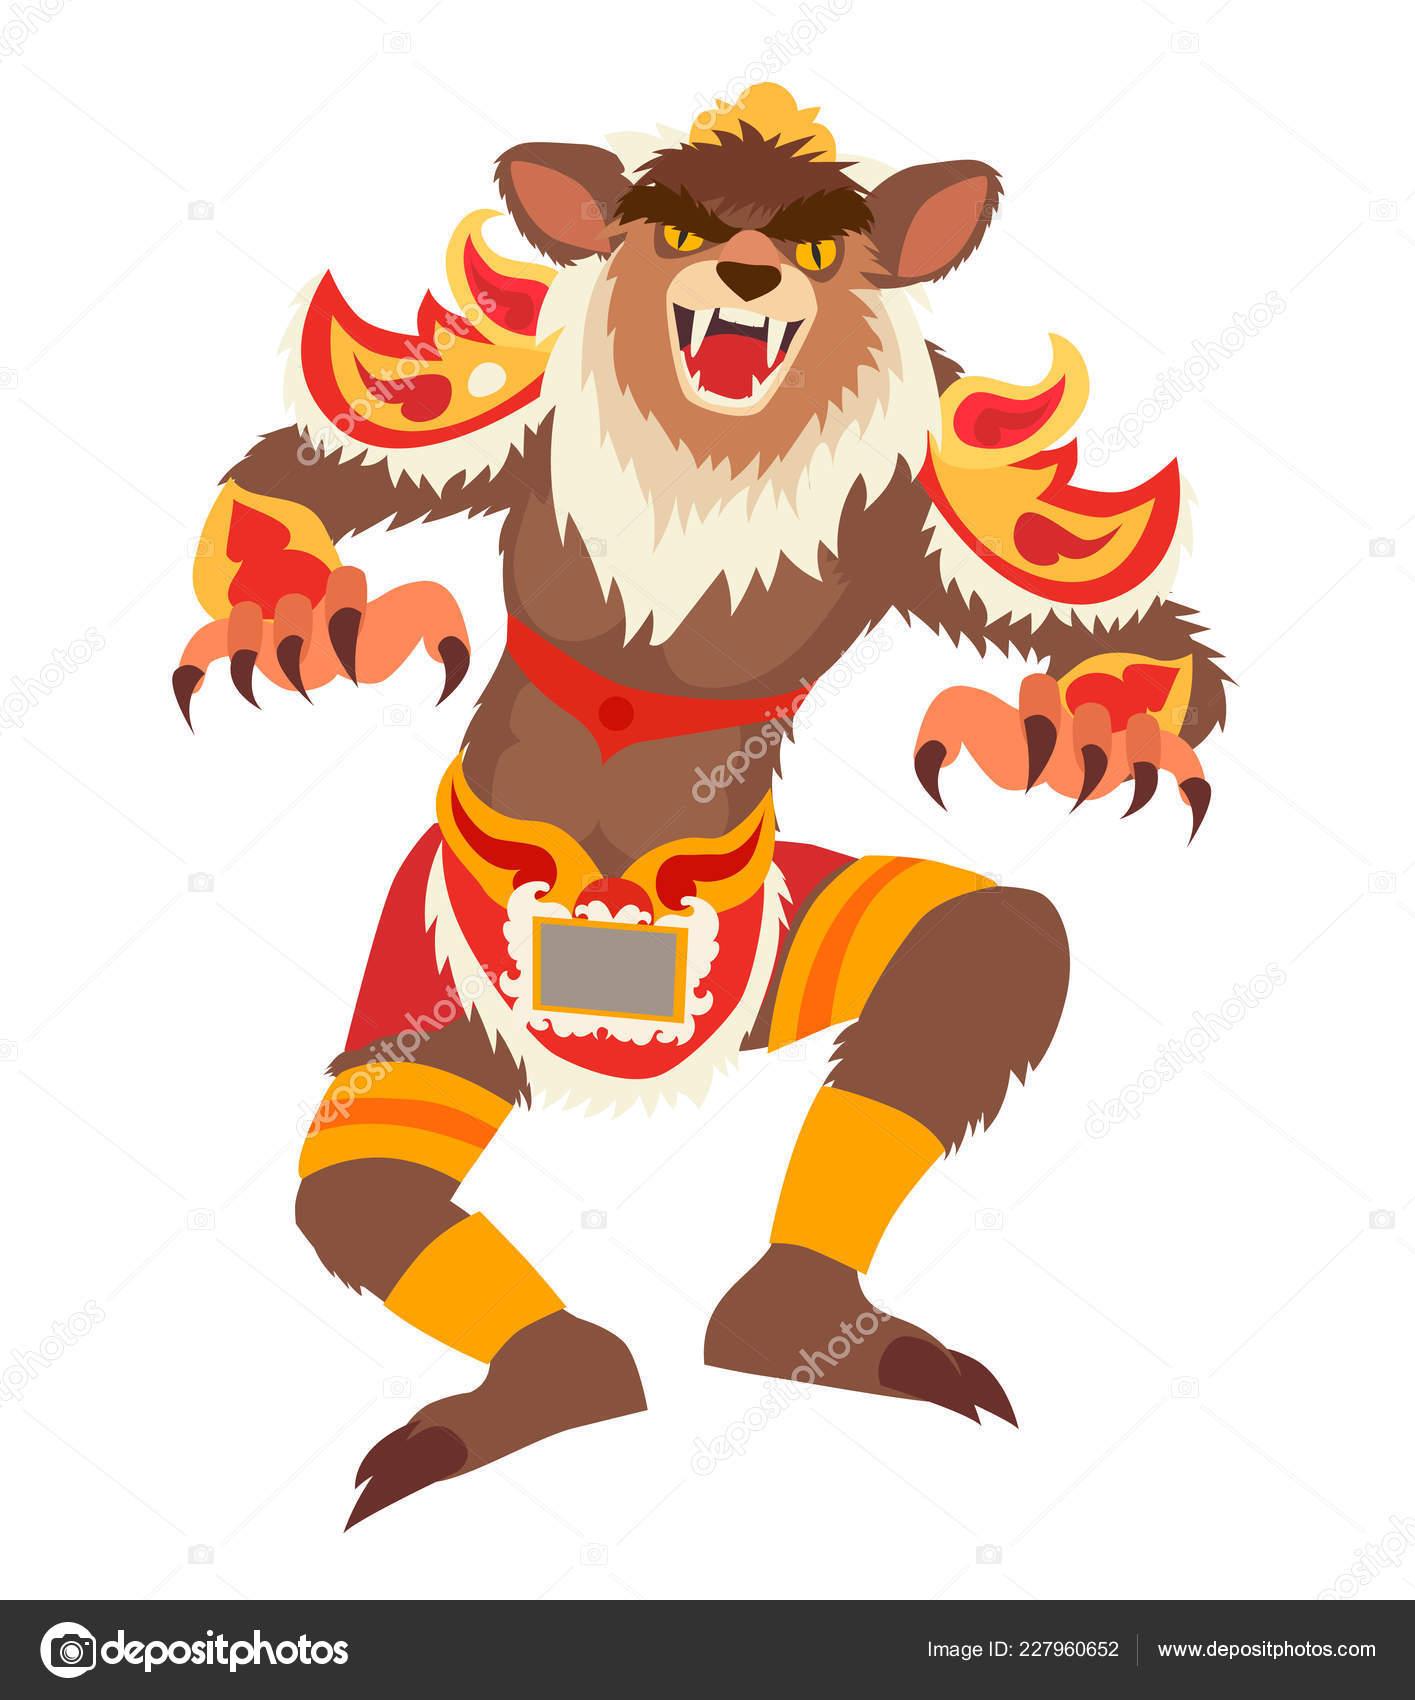 Áˆ Indonesian Demon Stock Vectors Royalty Free Ubud Illustrations Download On Depositphotos